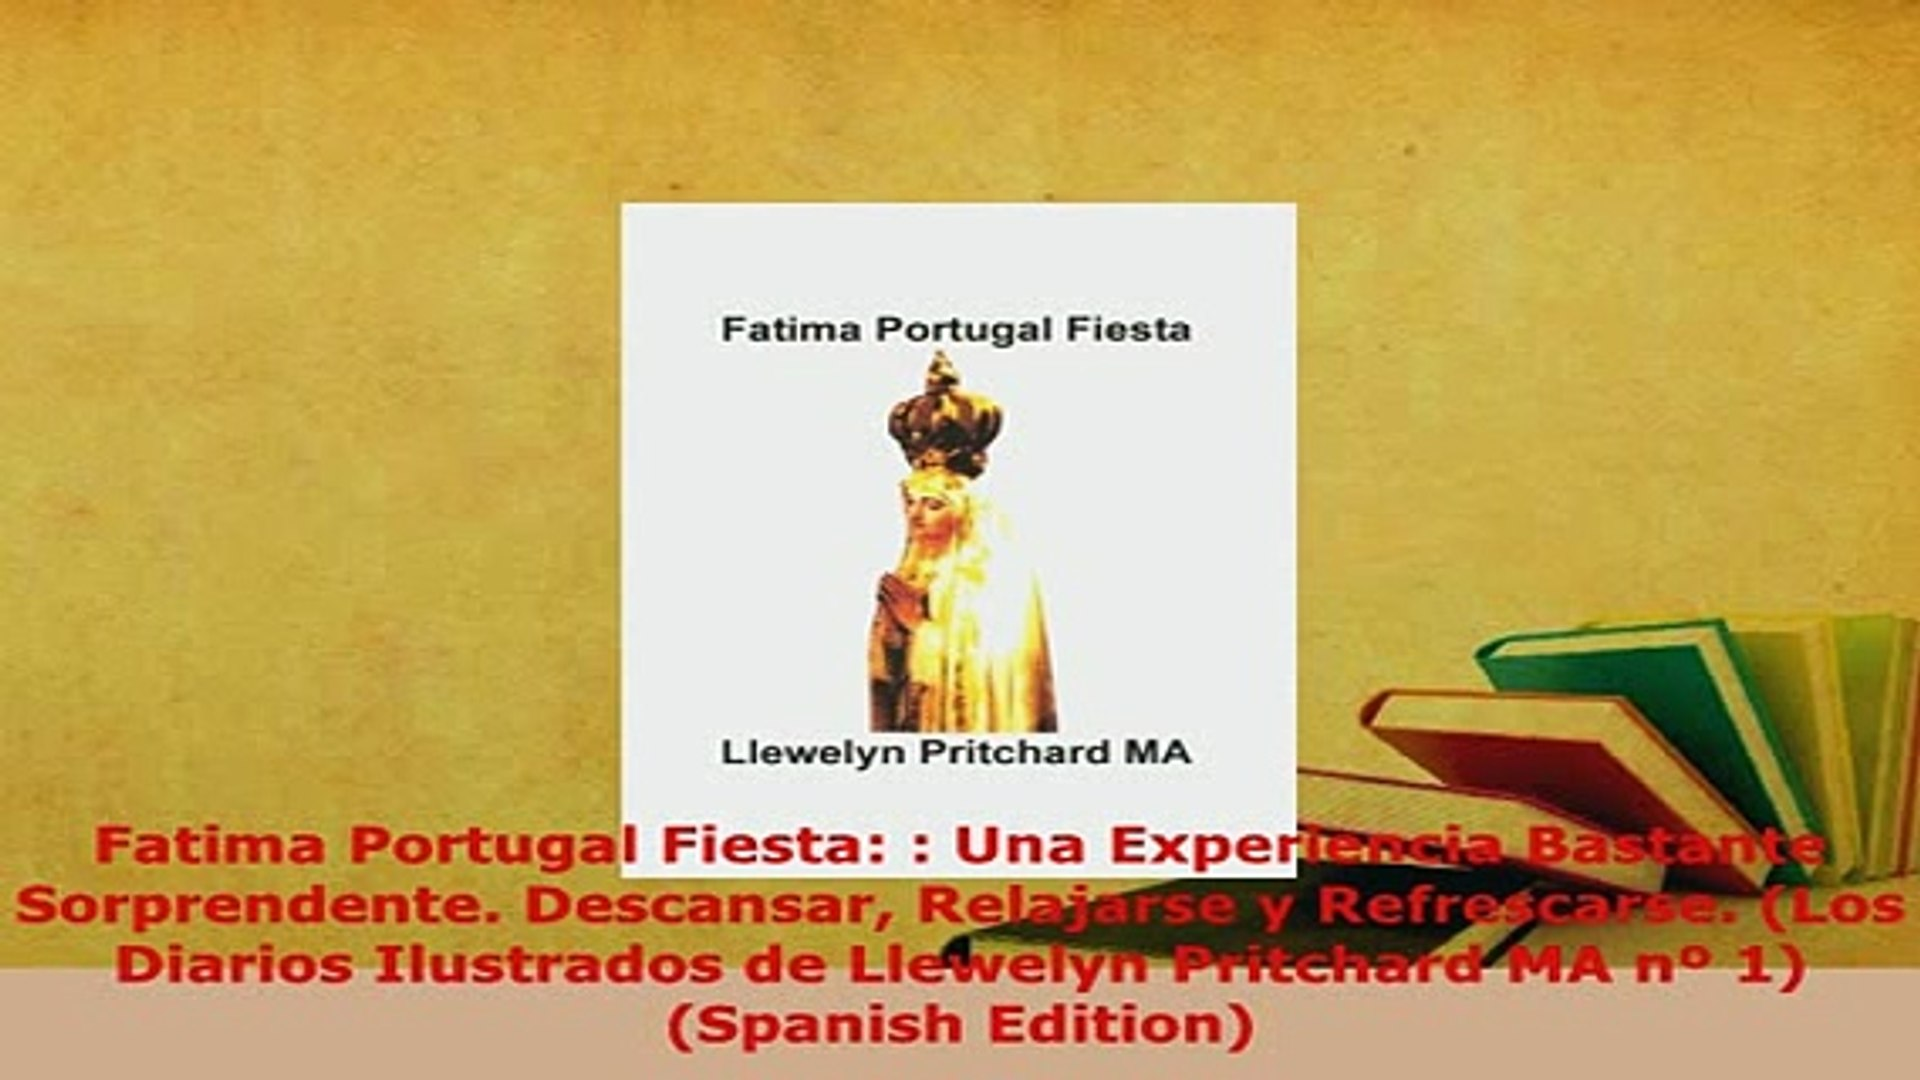 PDF  Fatima Portugal Fiesta  Una Experiencia Bastante Sorprendente Descansar Relajarse y Read Full E